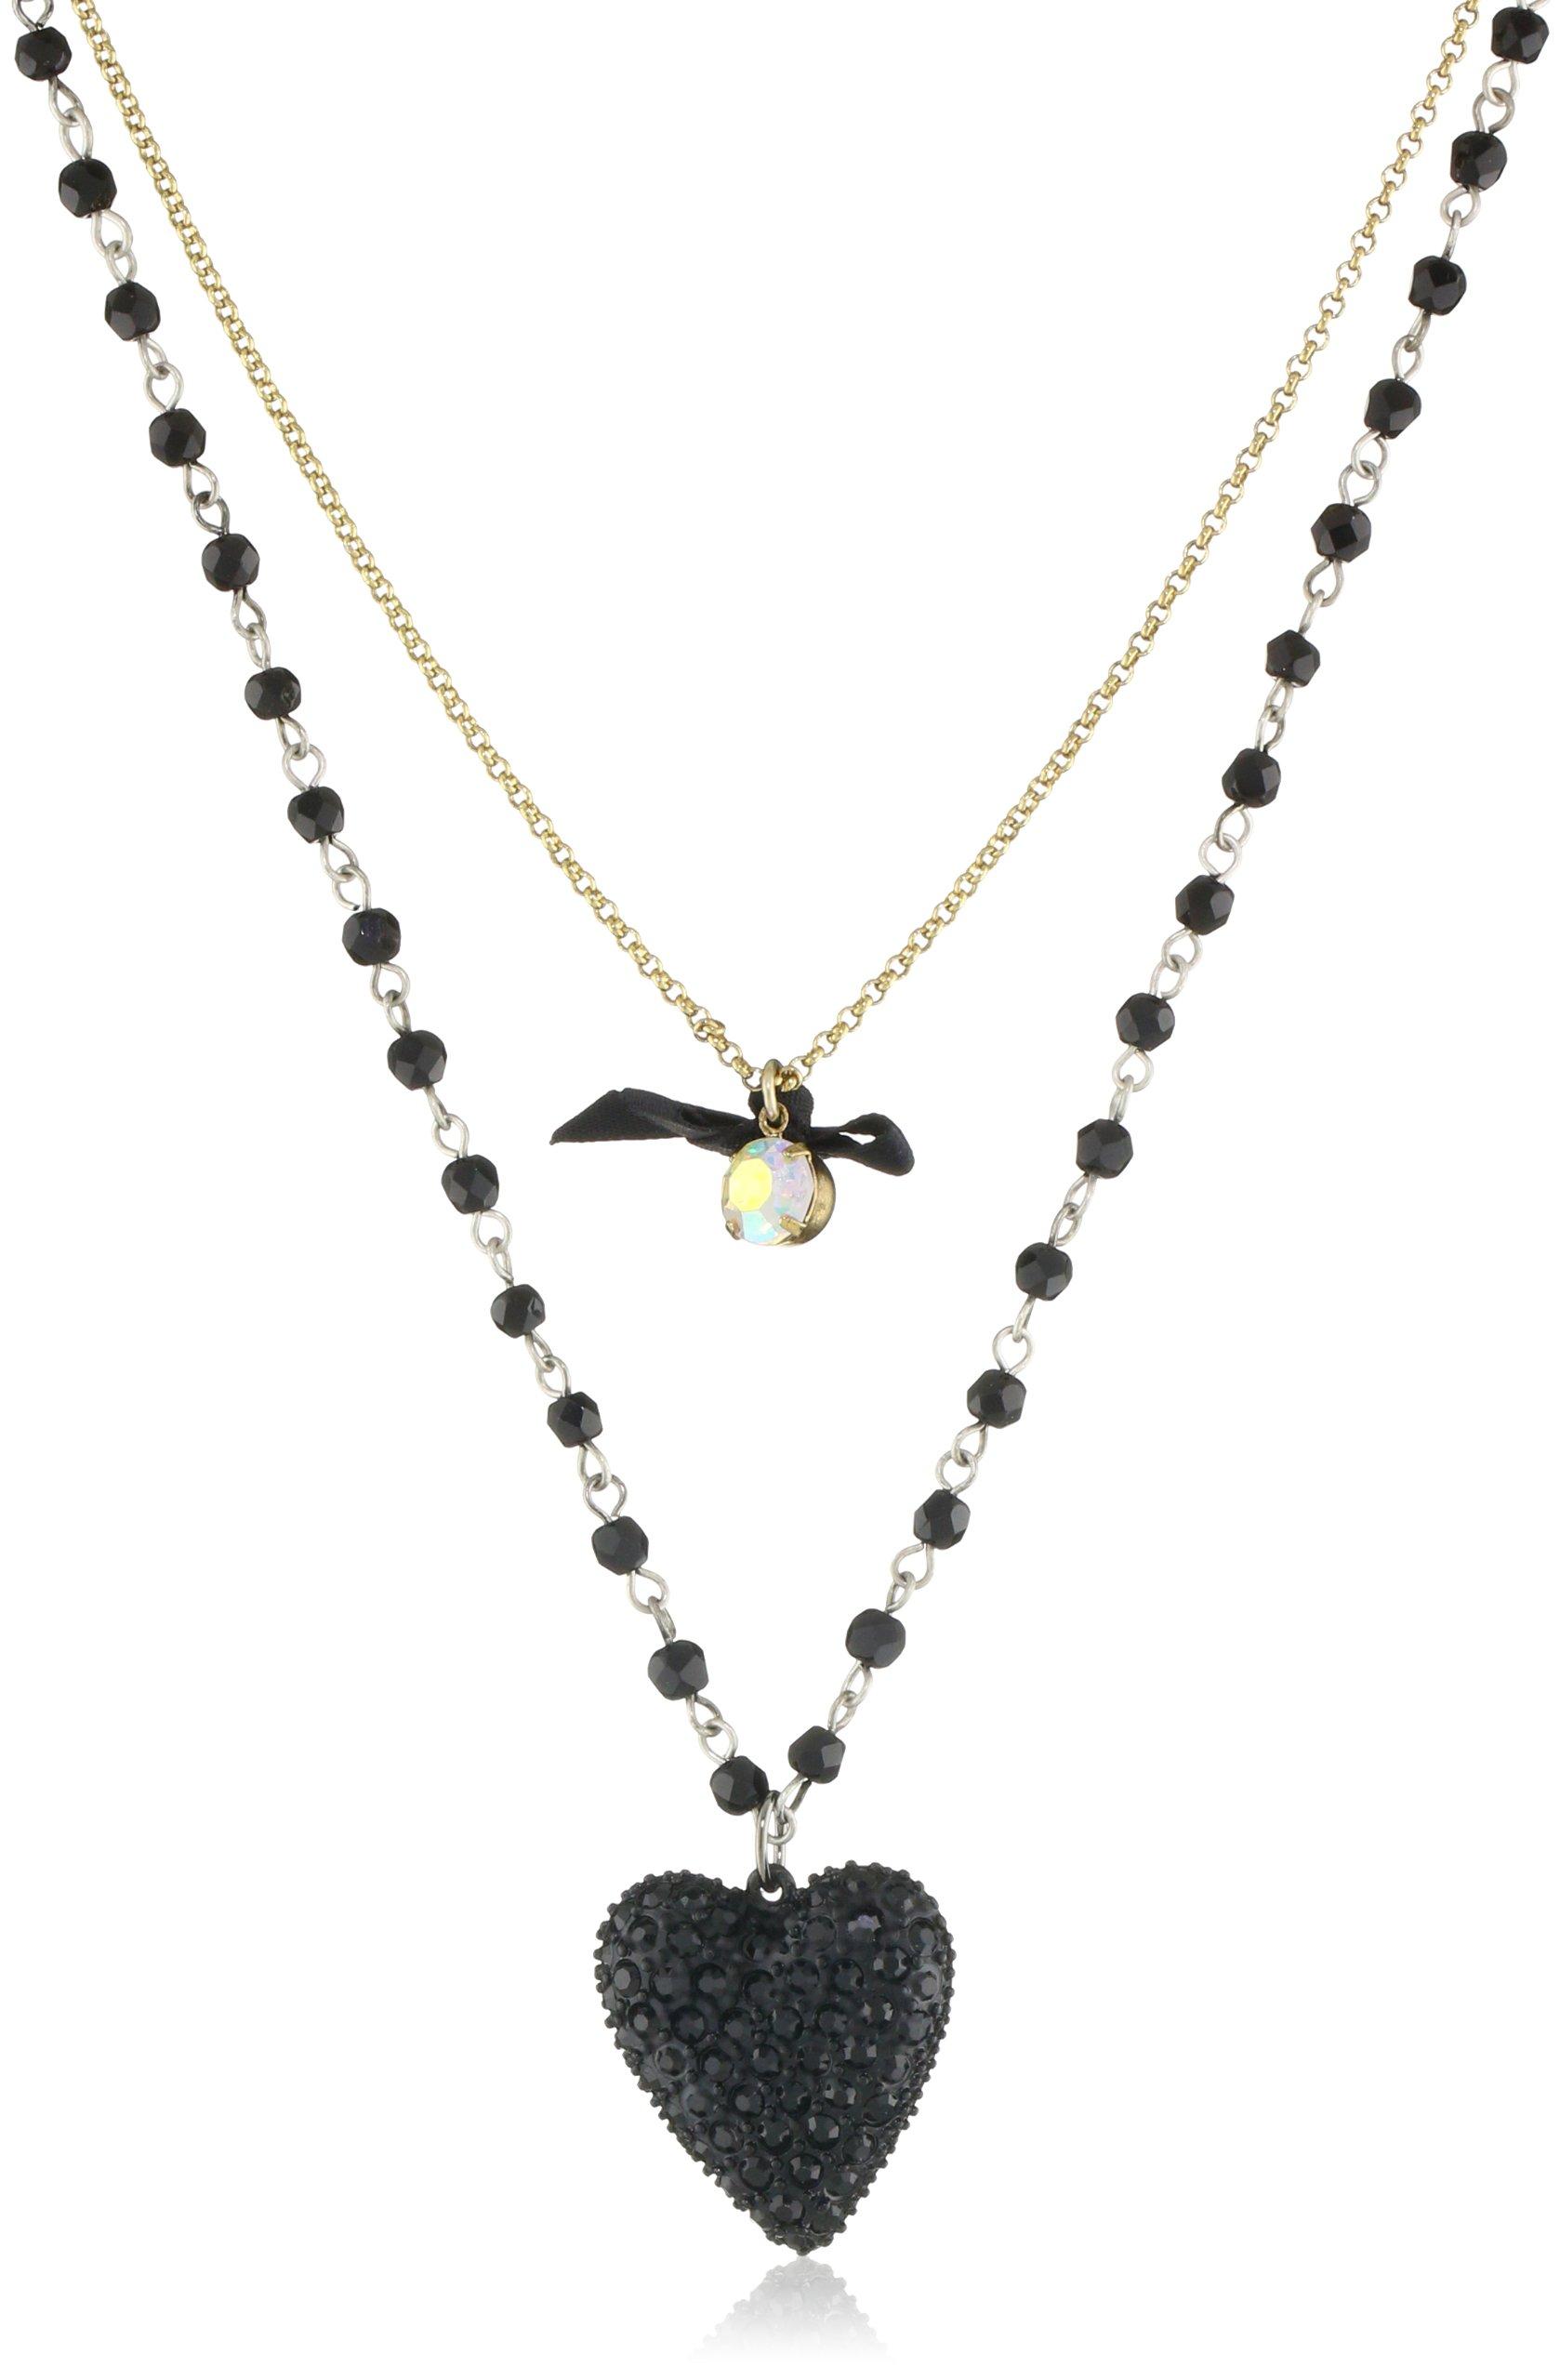 Betsey Johnson ''Essentials'' 2 Row Heart Pendant Necklace